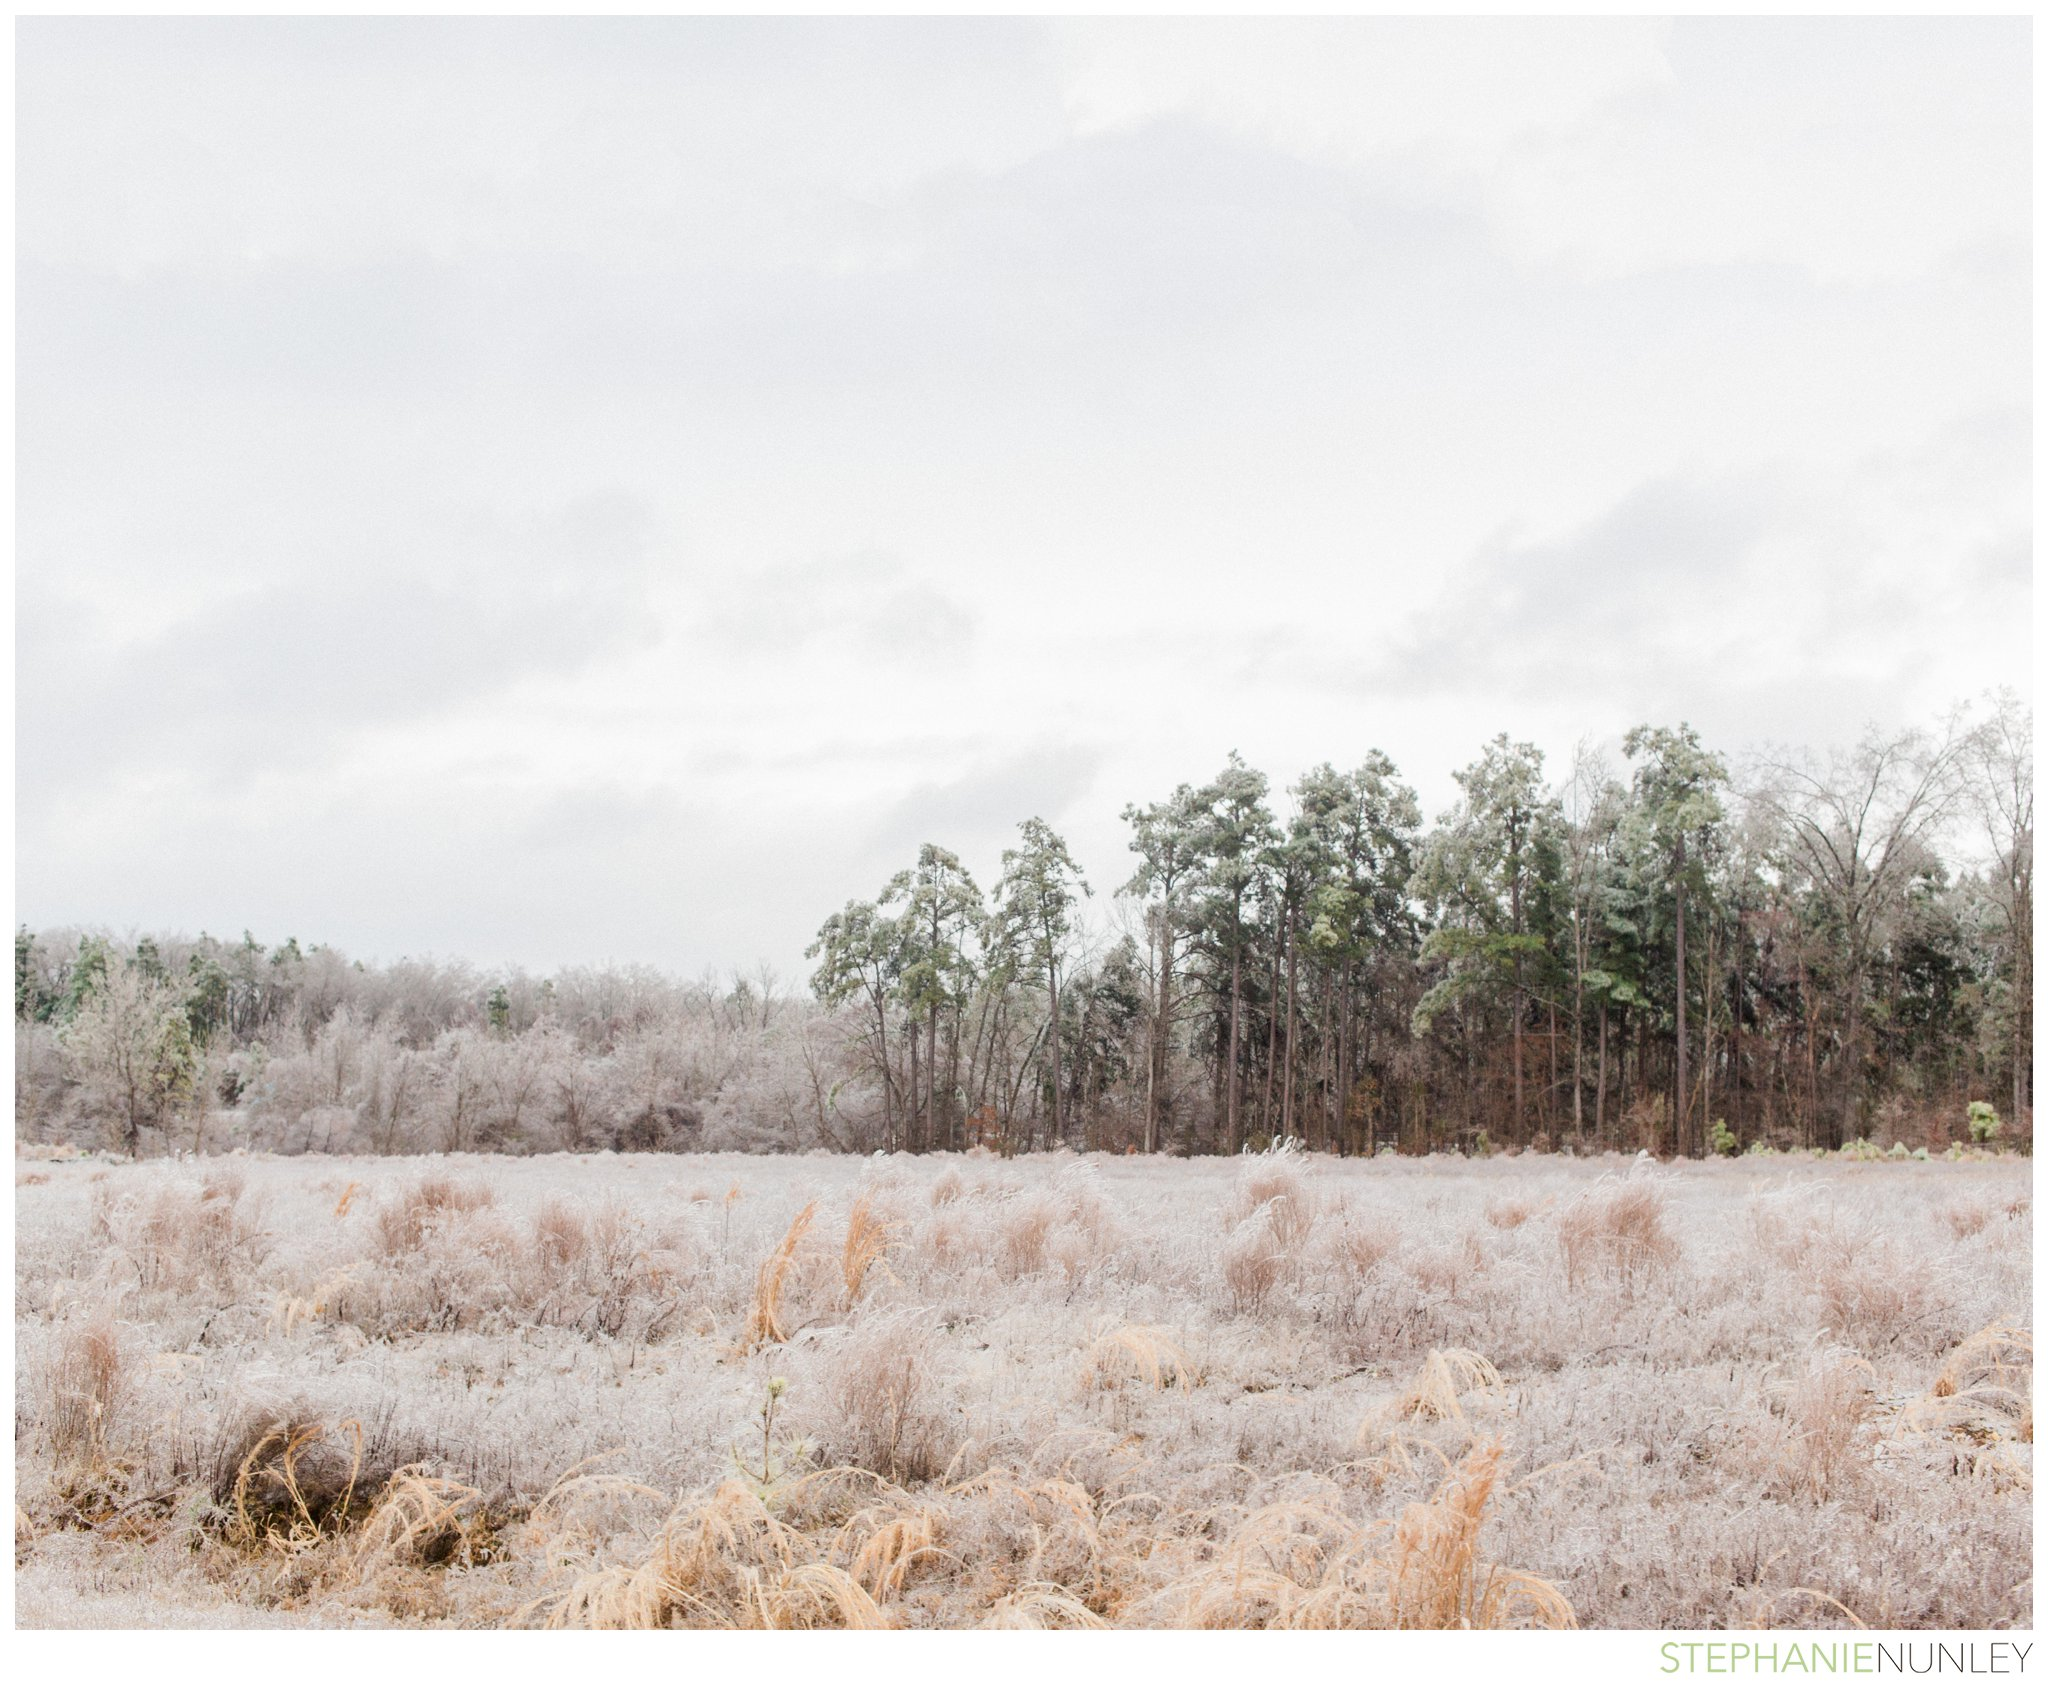 arkansas-winter-scenery-005.jpg